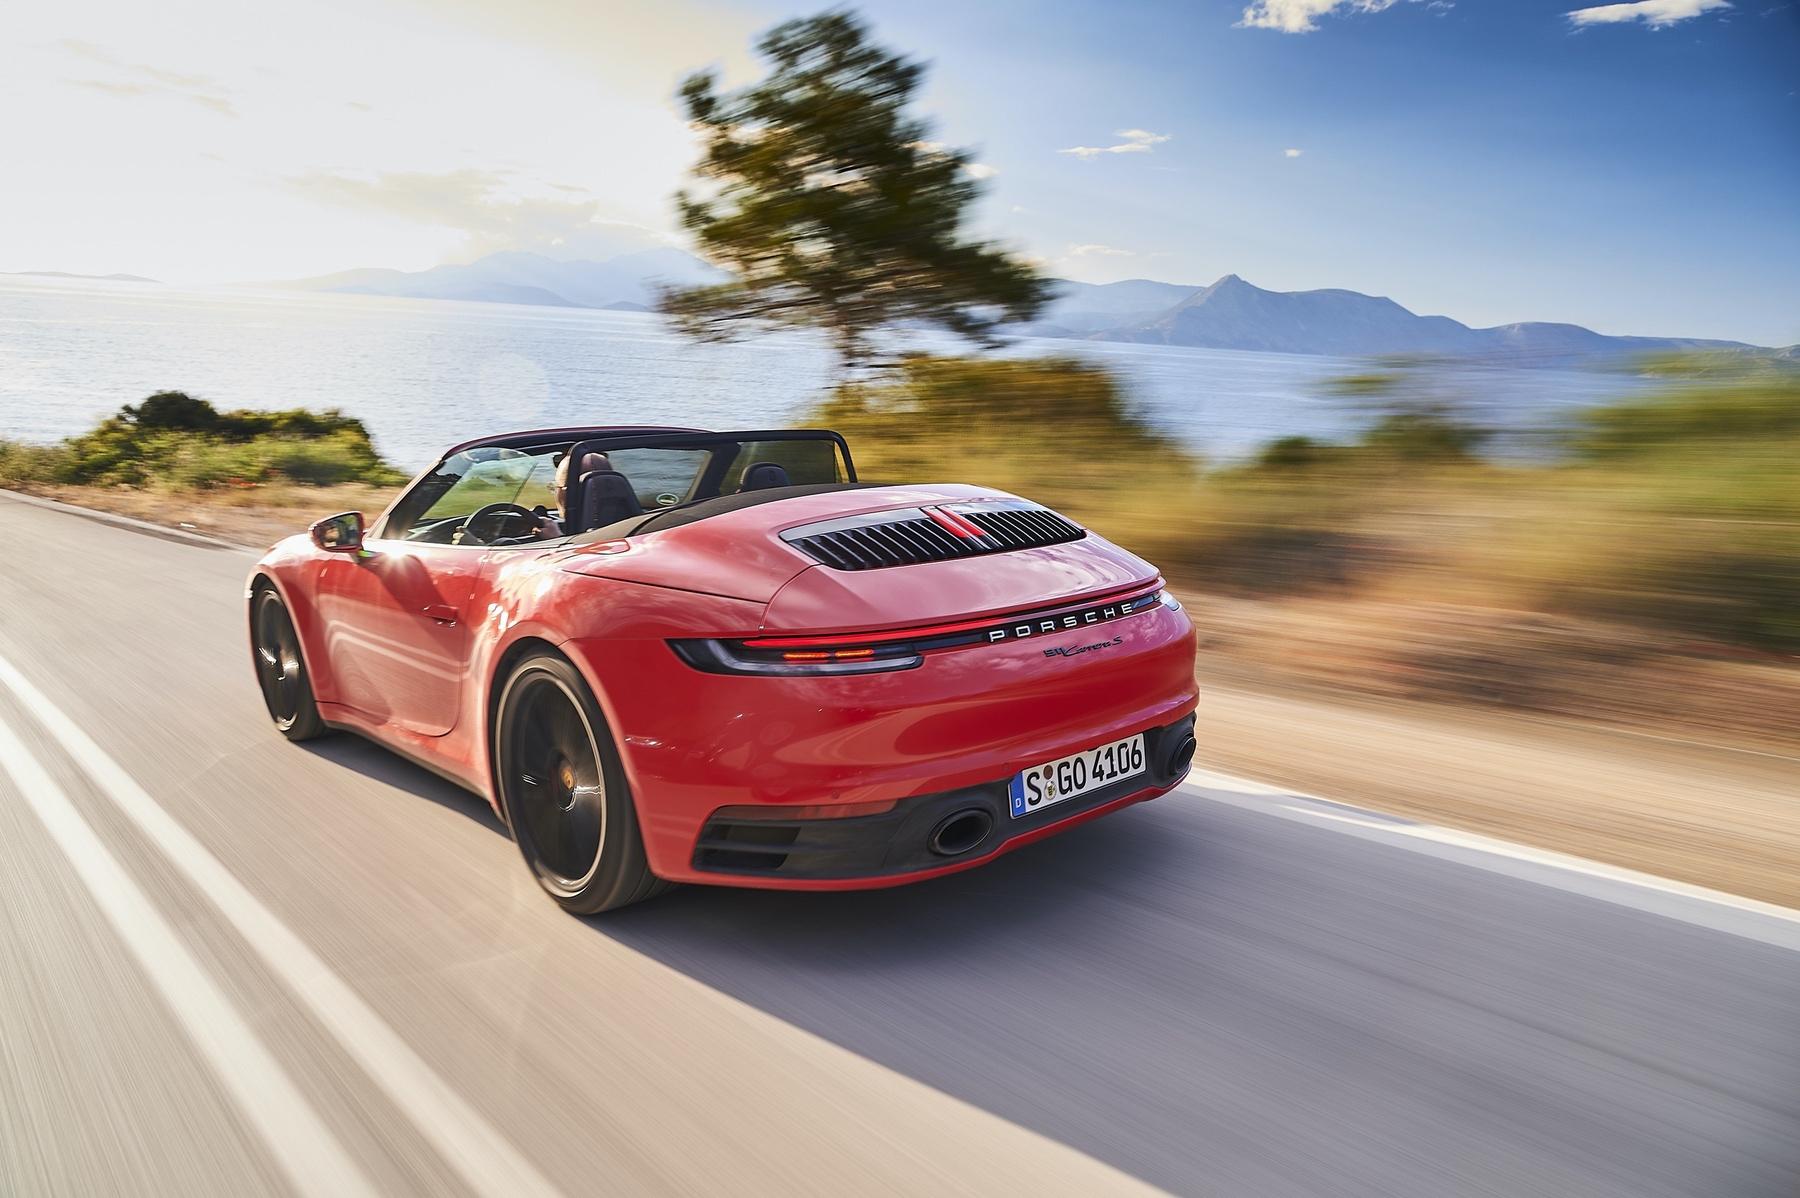 Test_Drive_Porsche_911_Athens_0128